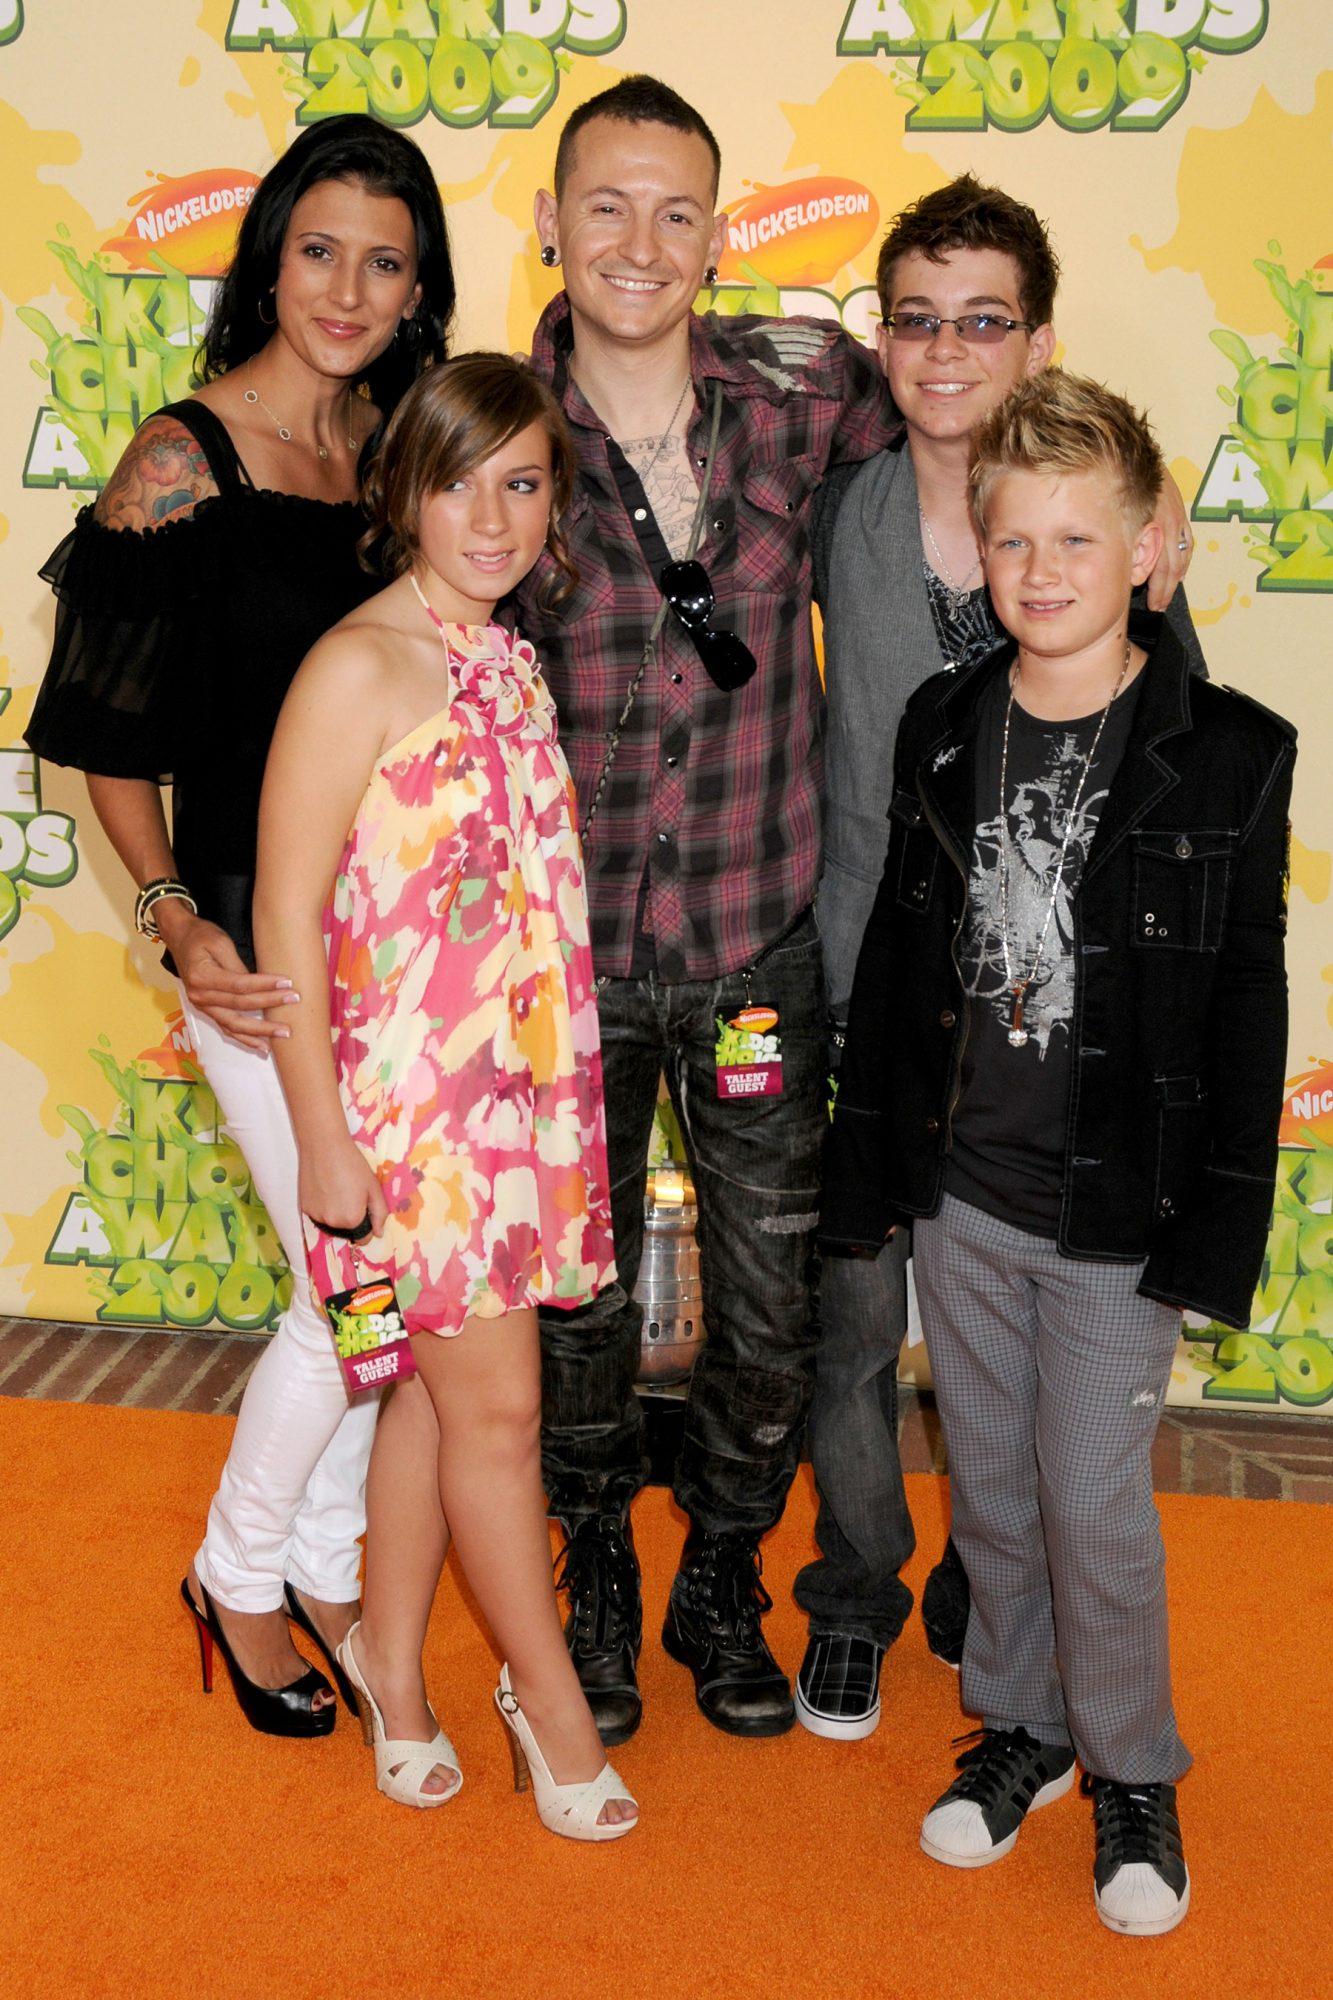 Nickelodeon's 22nd Annual Kid's Choice Awards